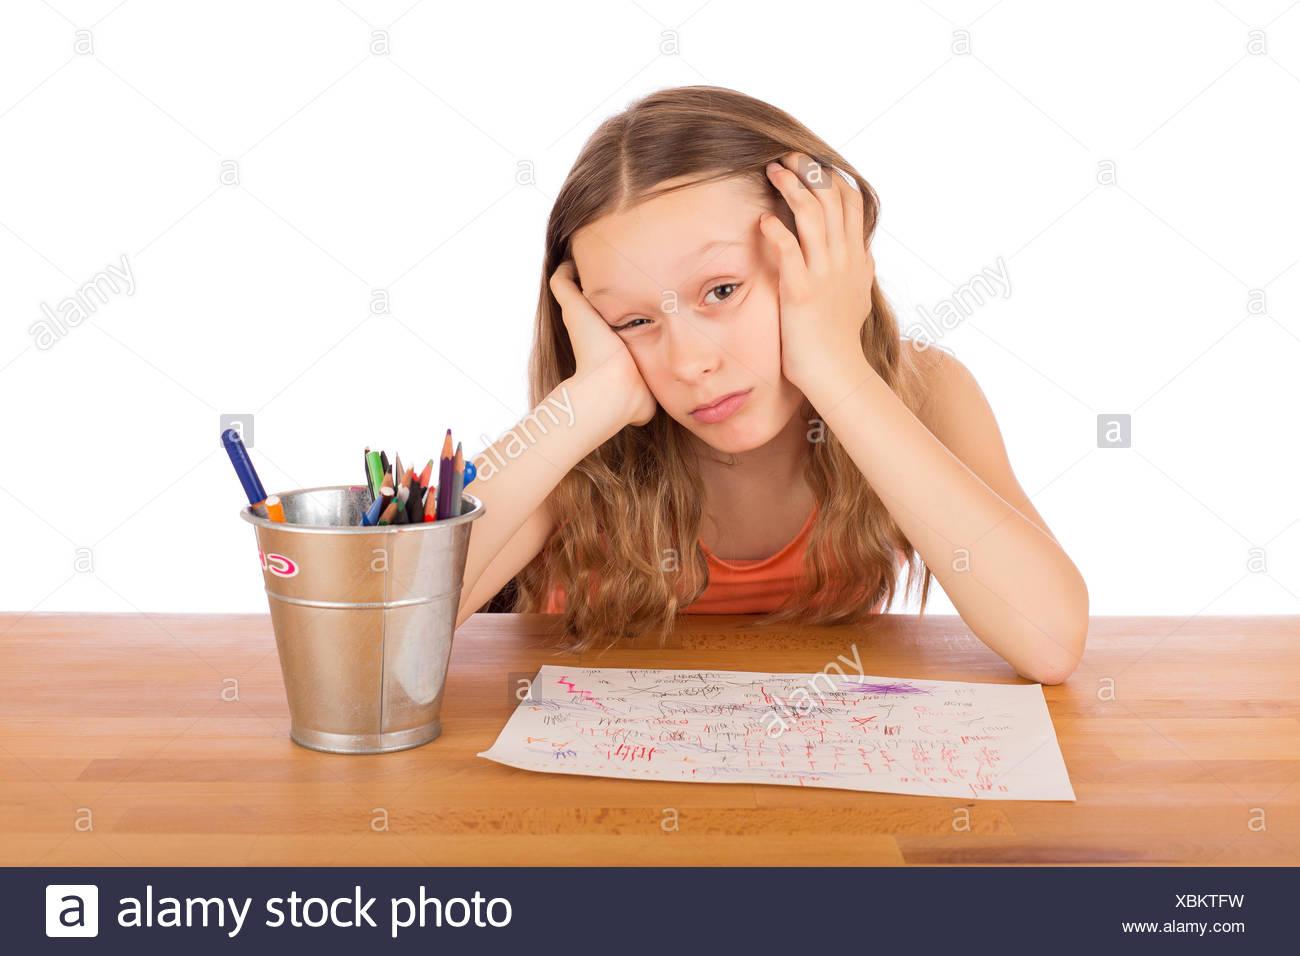 Sad child lack of ideas - Stock Image